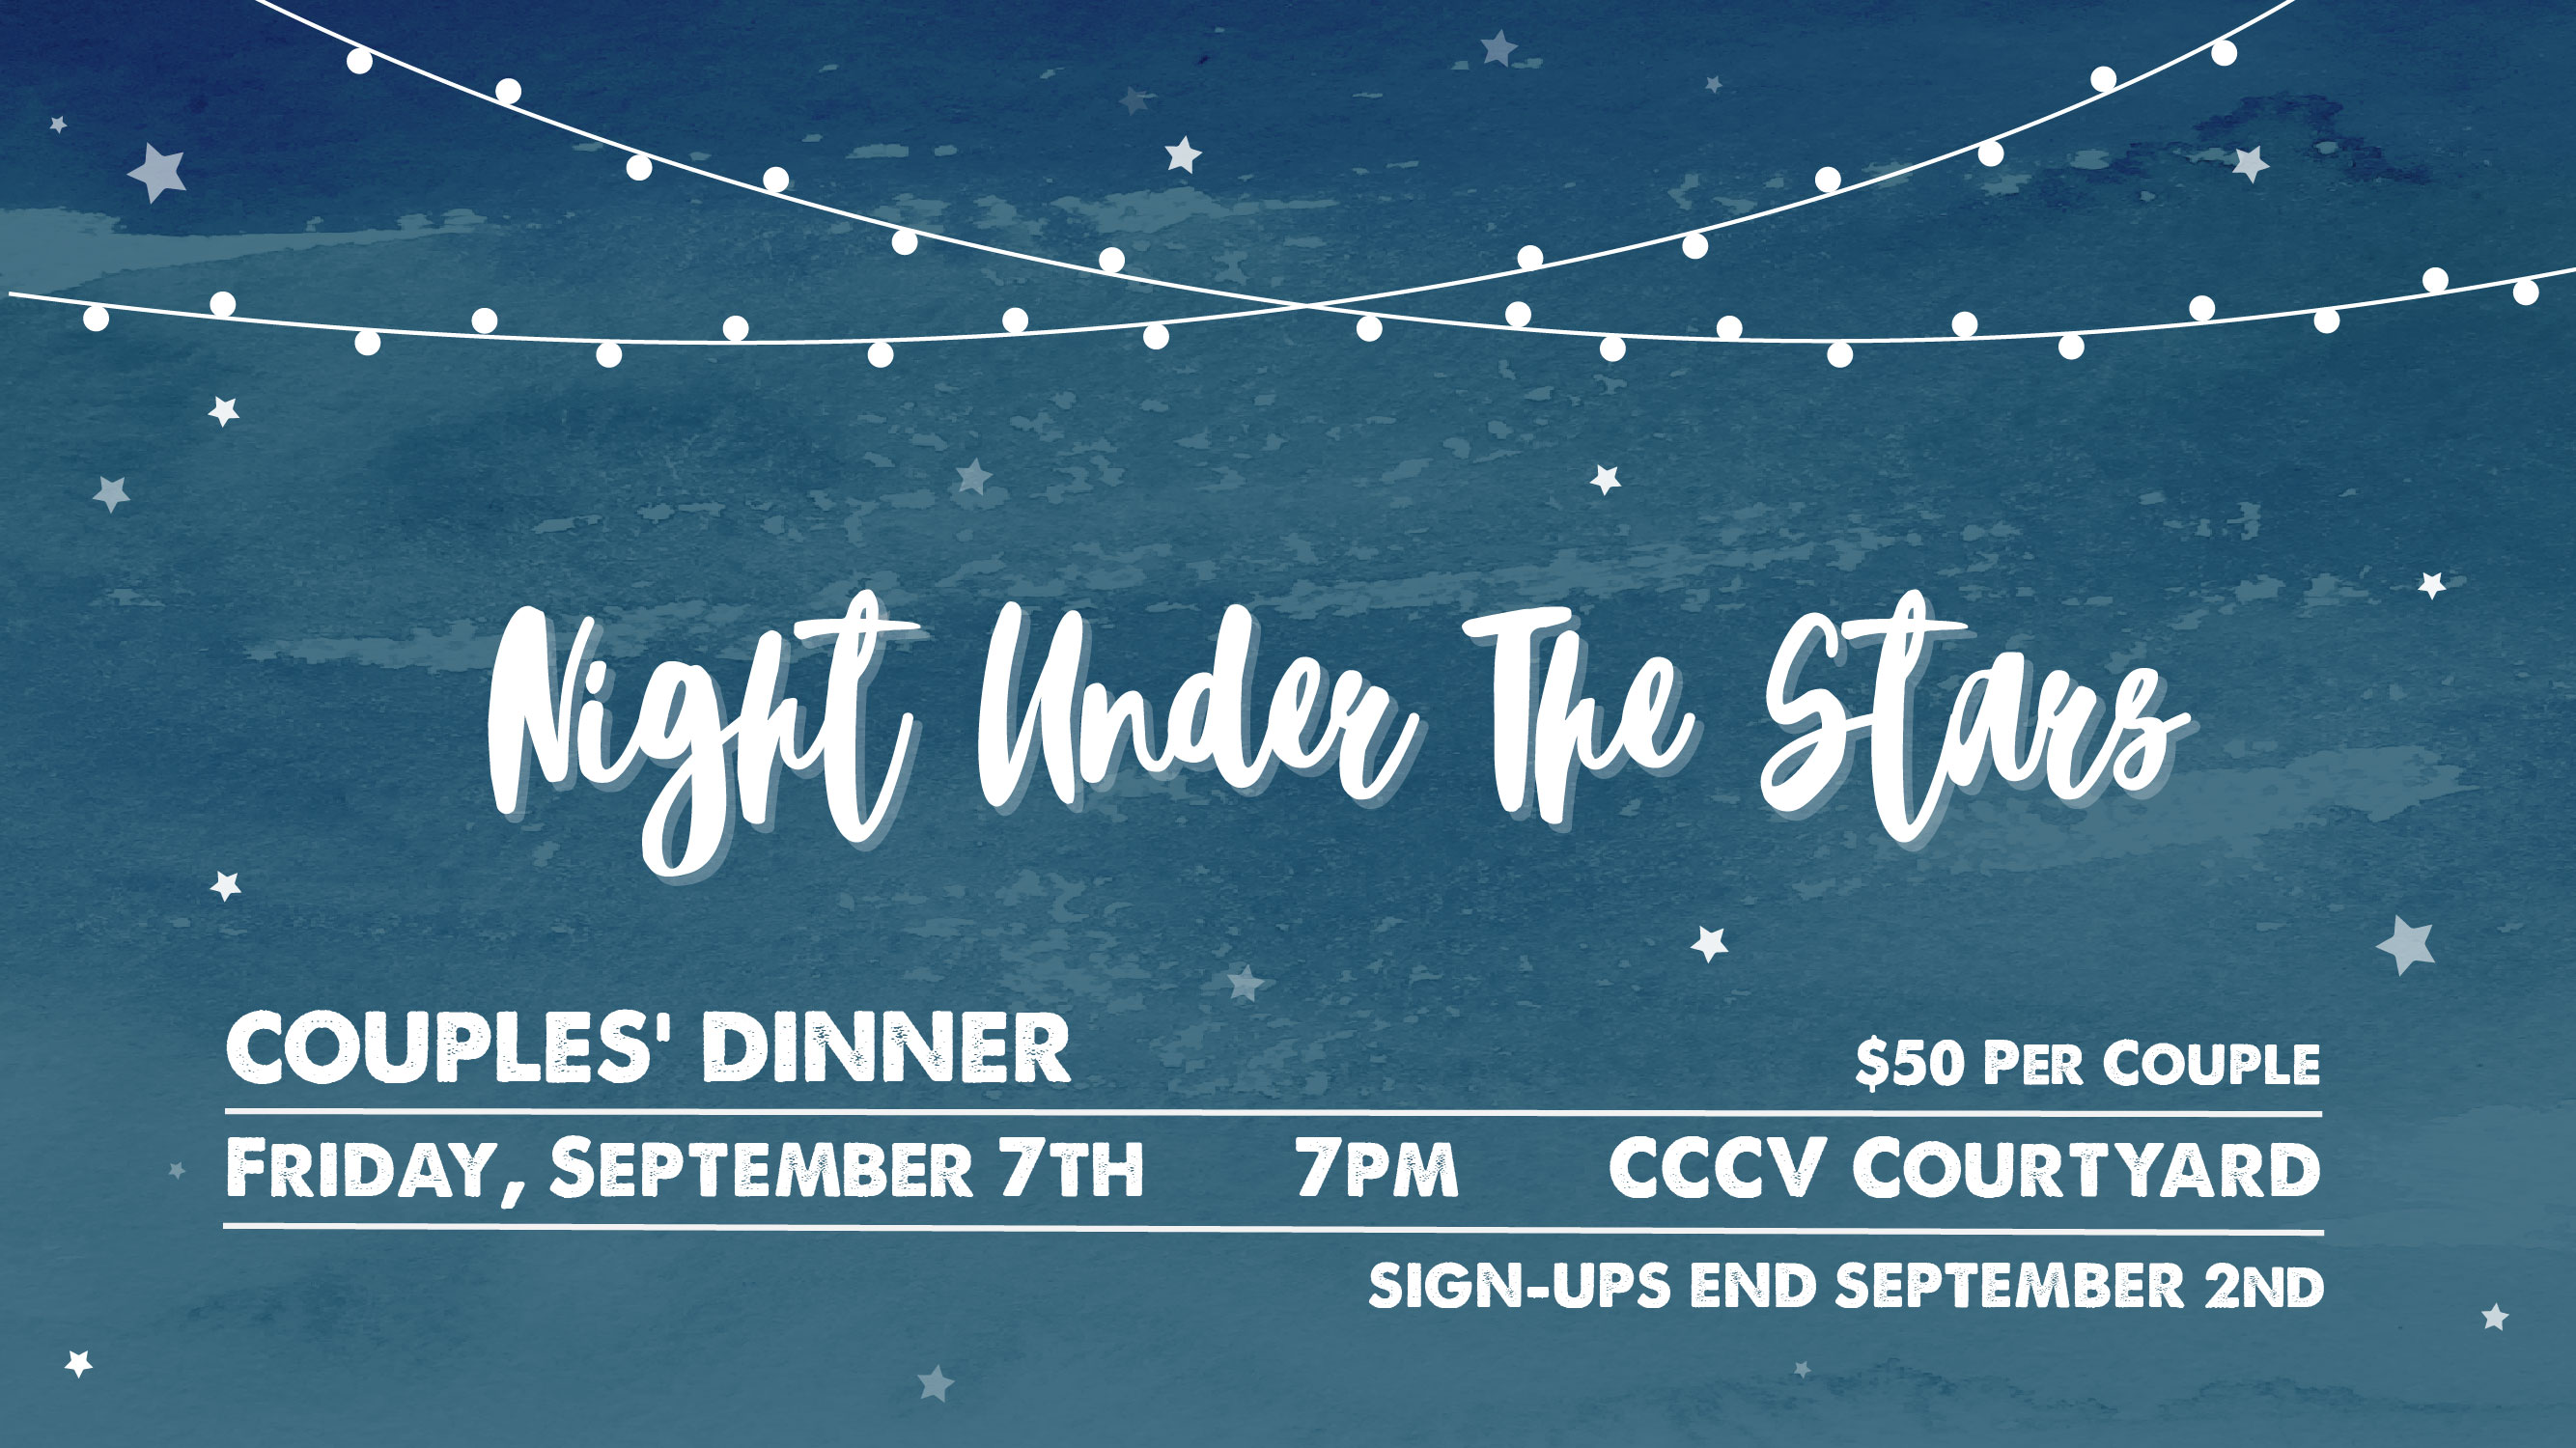 Cg couples dinner night